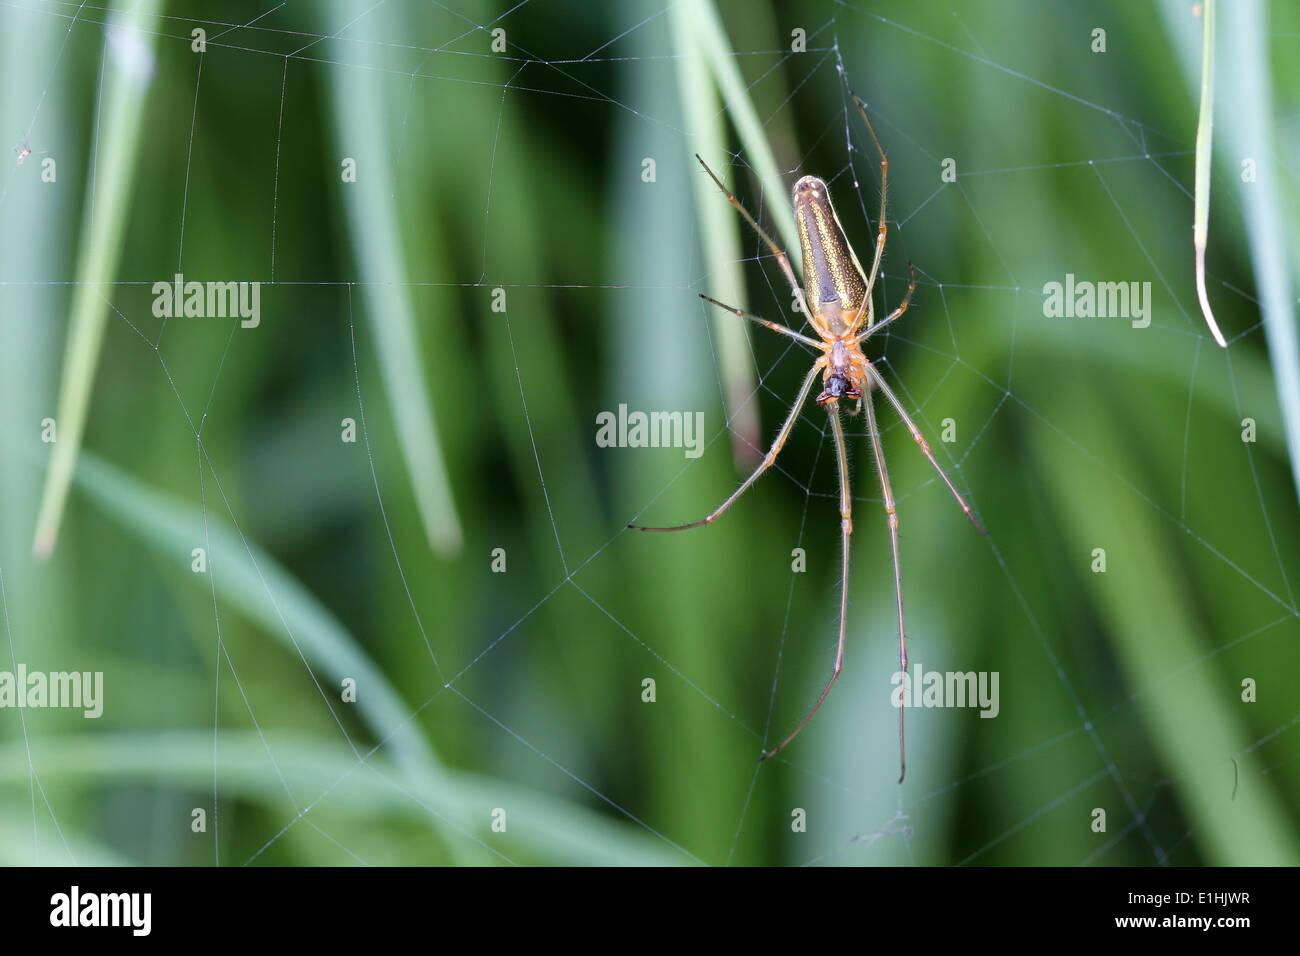 Longjawed Orbweaver (Tetragnatha extensa) in the spiderweb, Mecklenburg-Western Pomerania, Germany - Stock Image